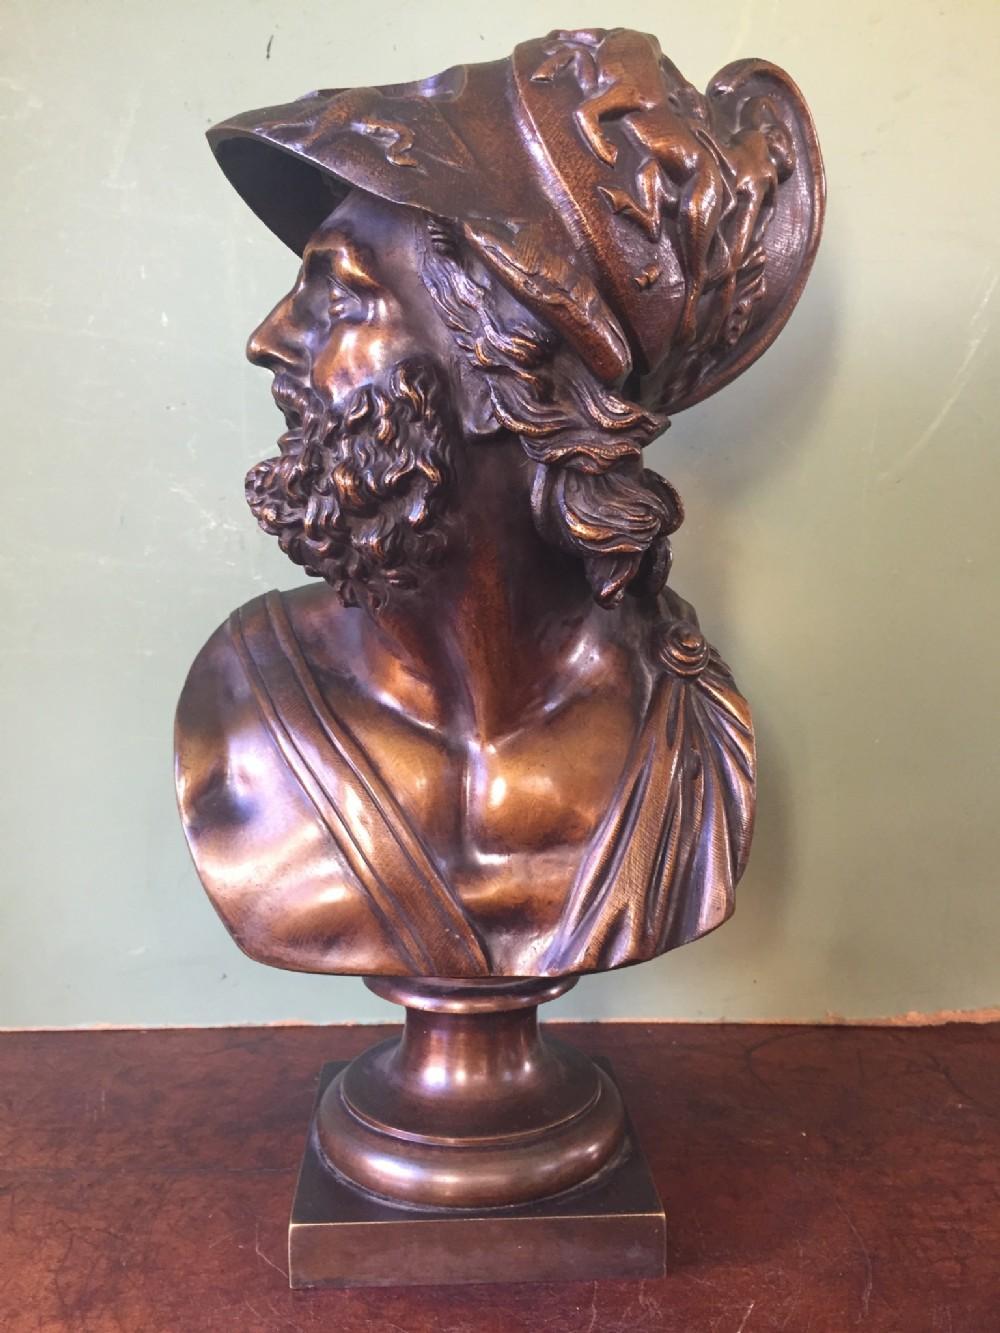 late c19th 'grand tour' souvenir bronze bust study of the mythological greek hero ajax